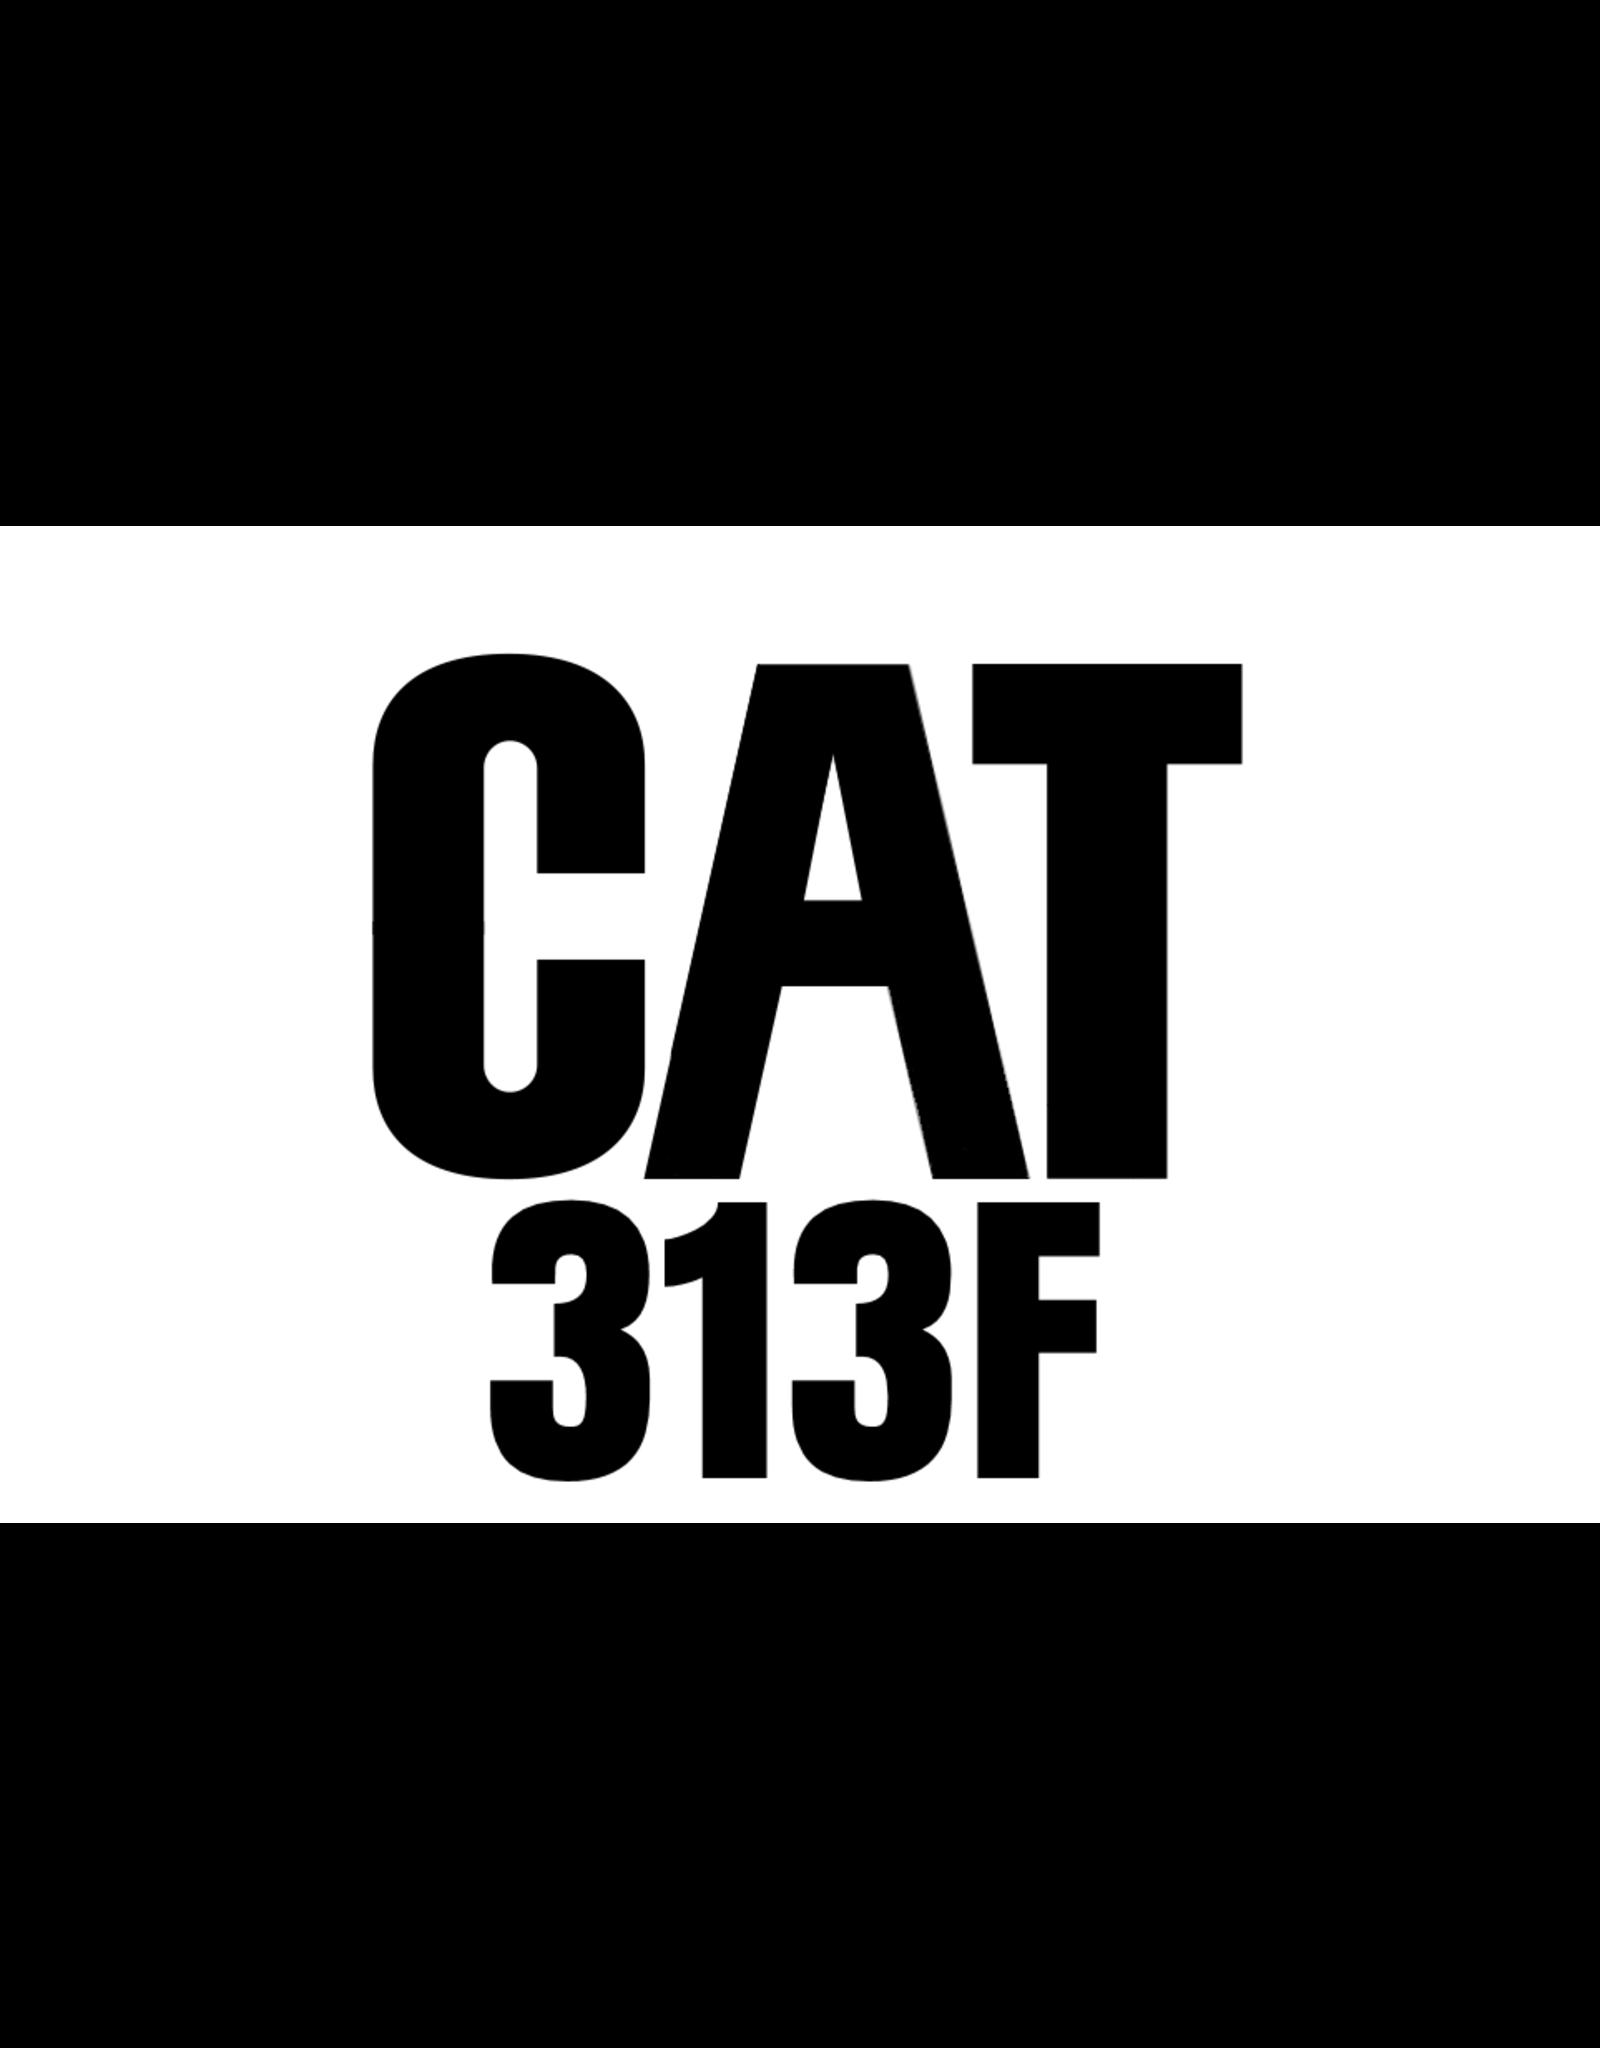 Echle Hartstahl GmbH FOPS for CAT 313F